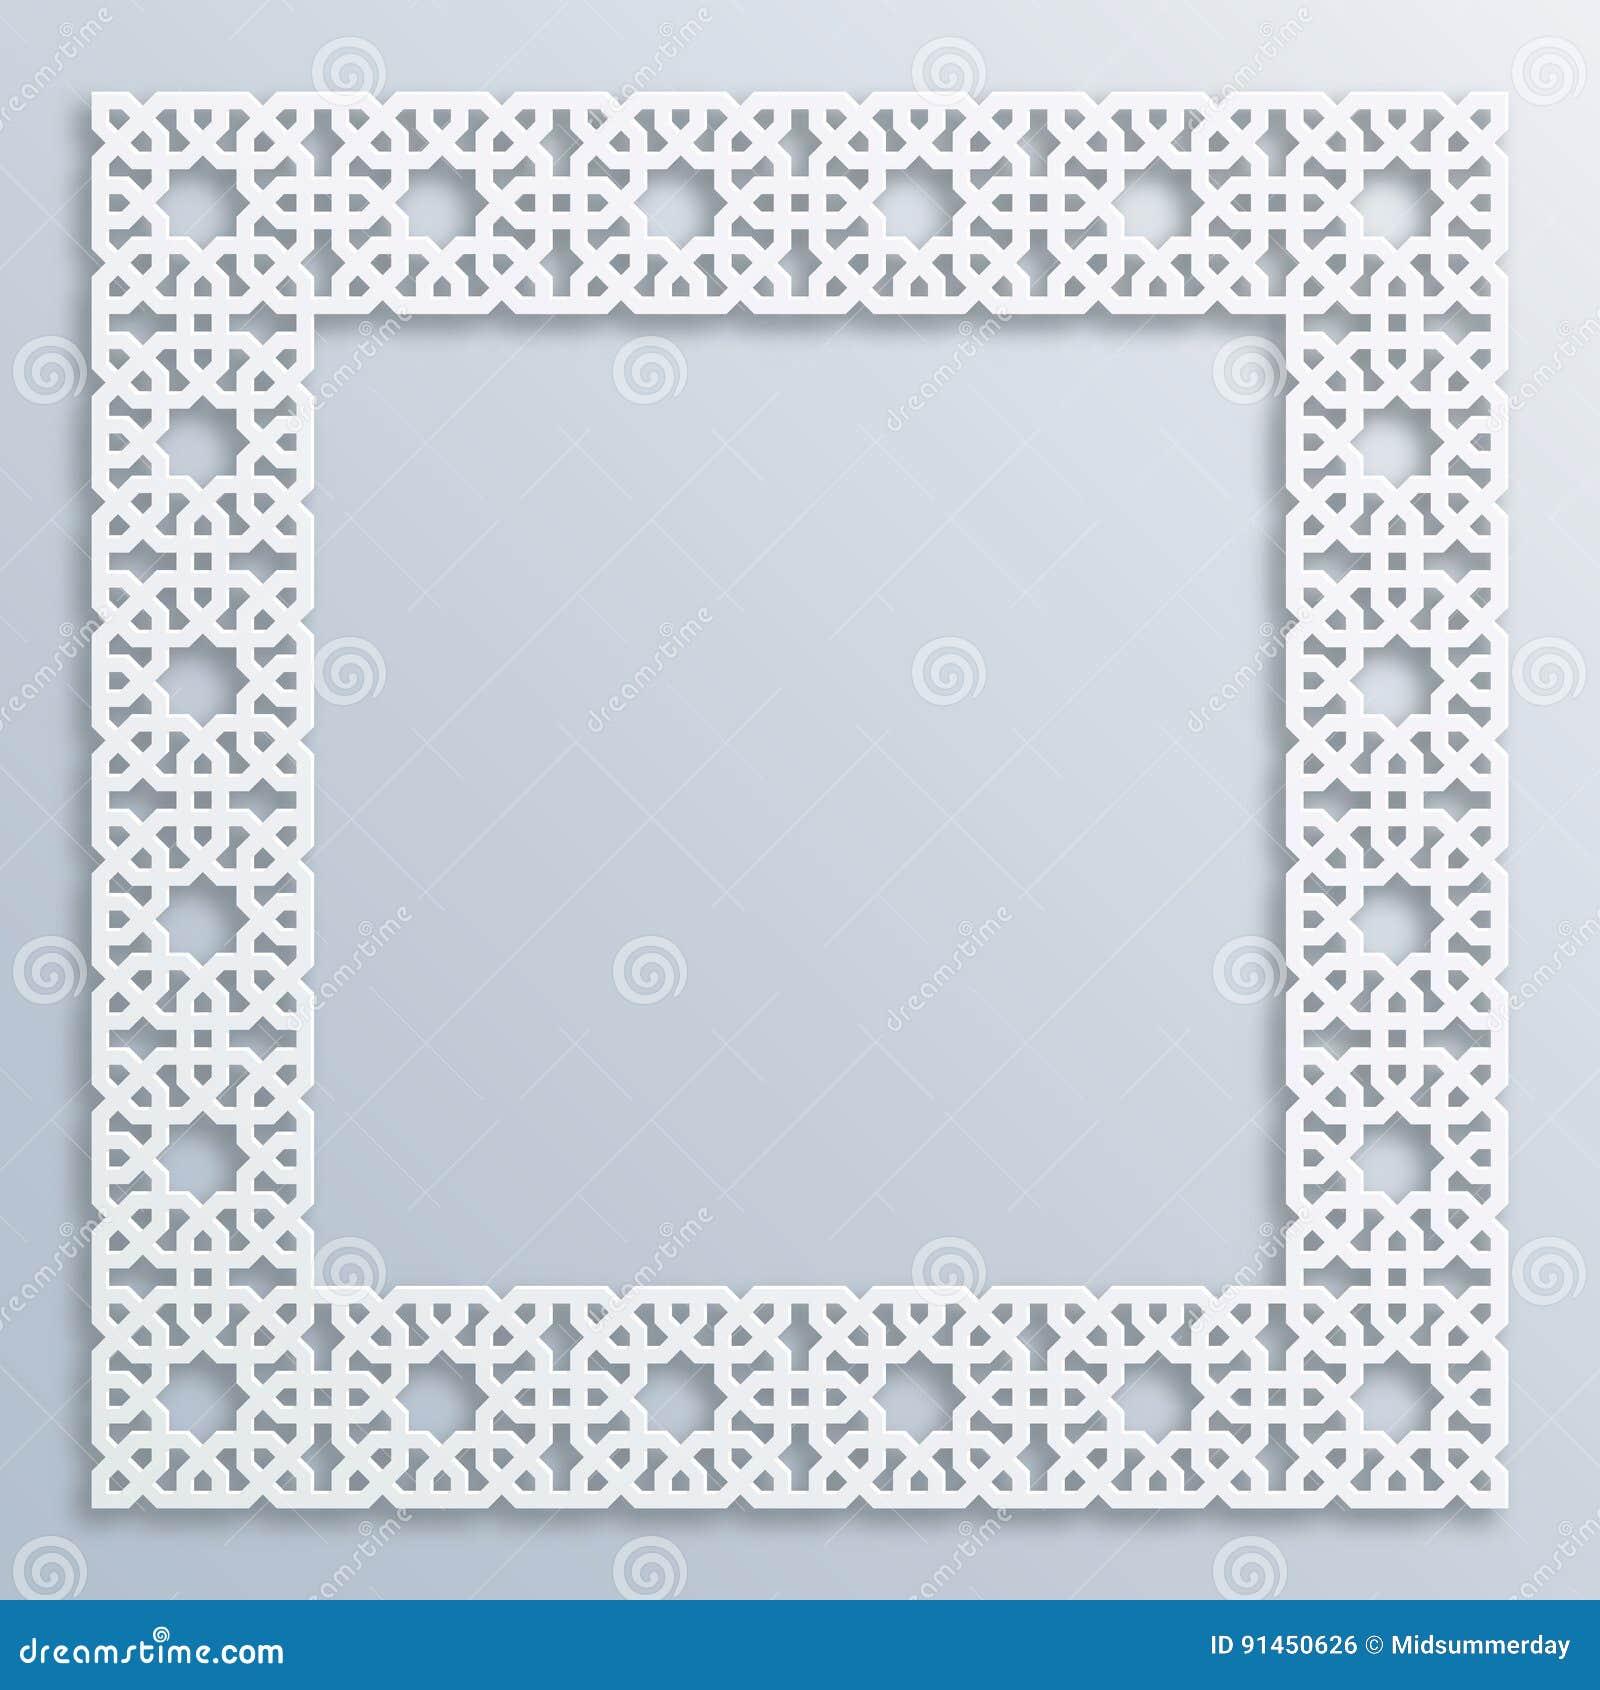 3d Square White Frame Vignette Islamic Geometric Border